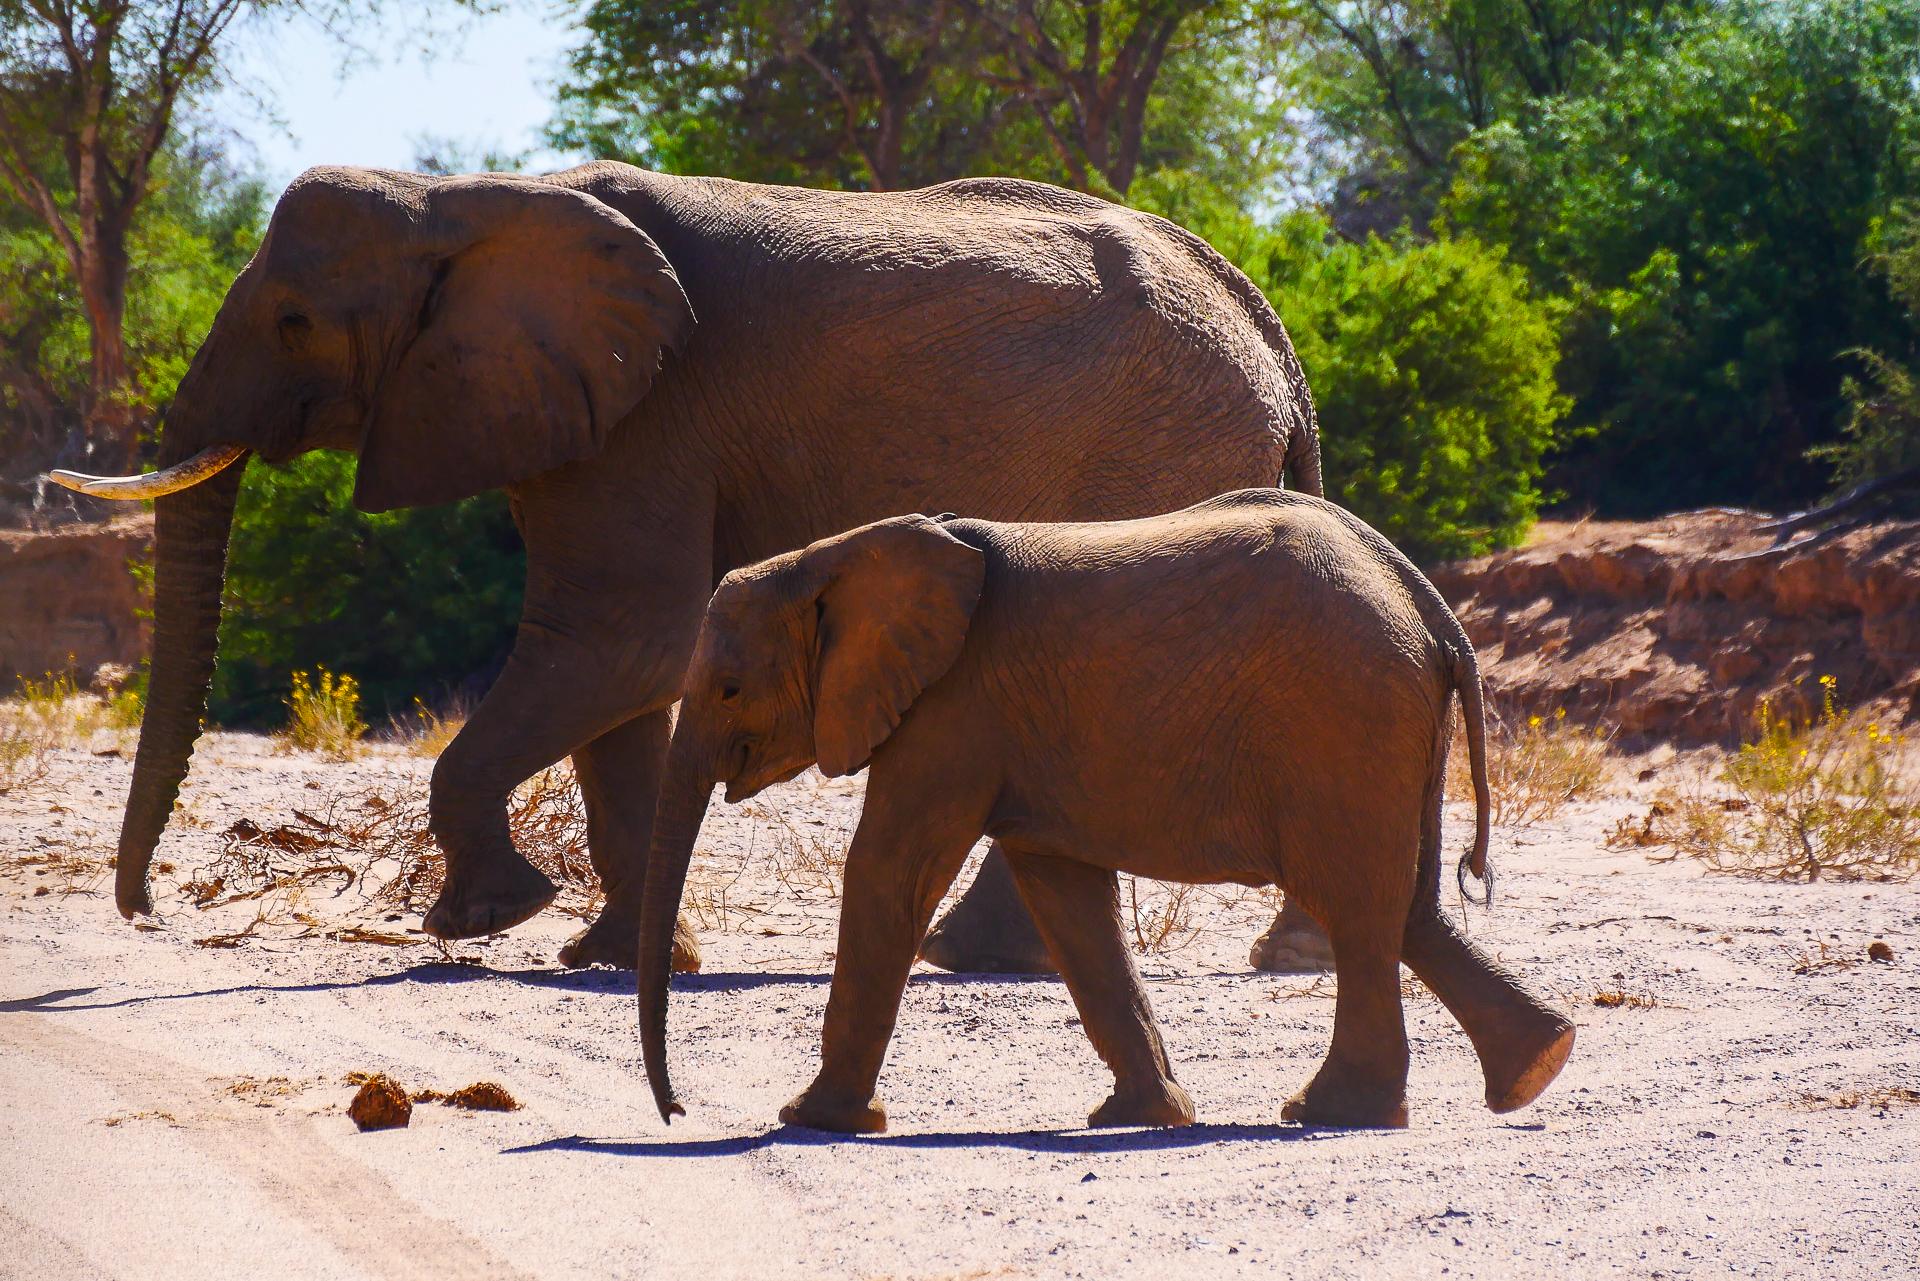 éléphants du désert namibien